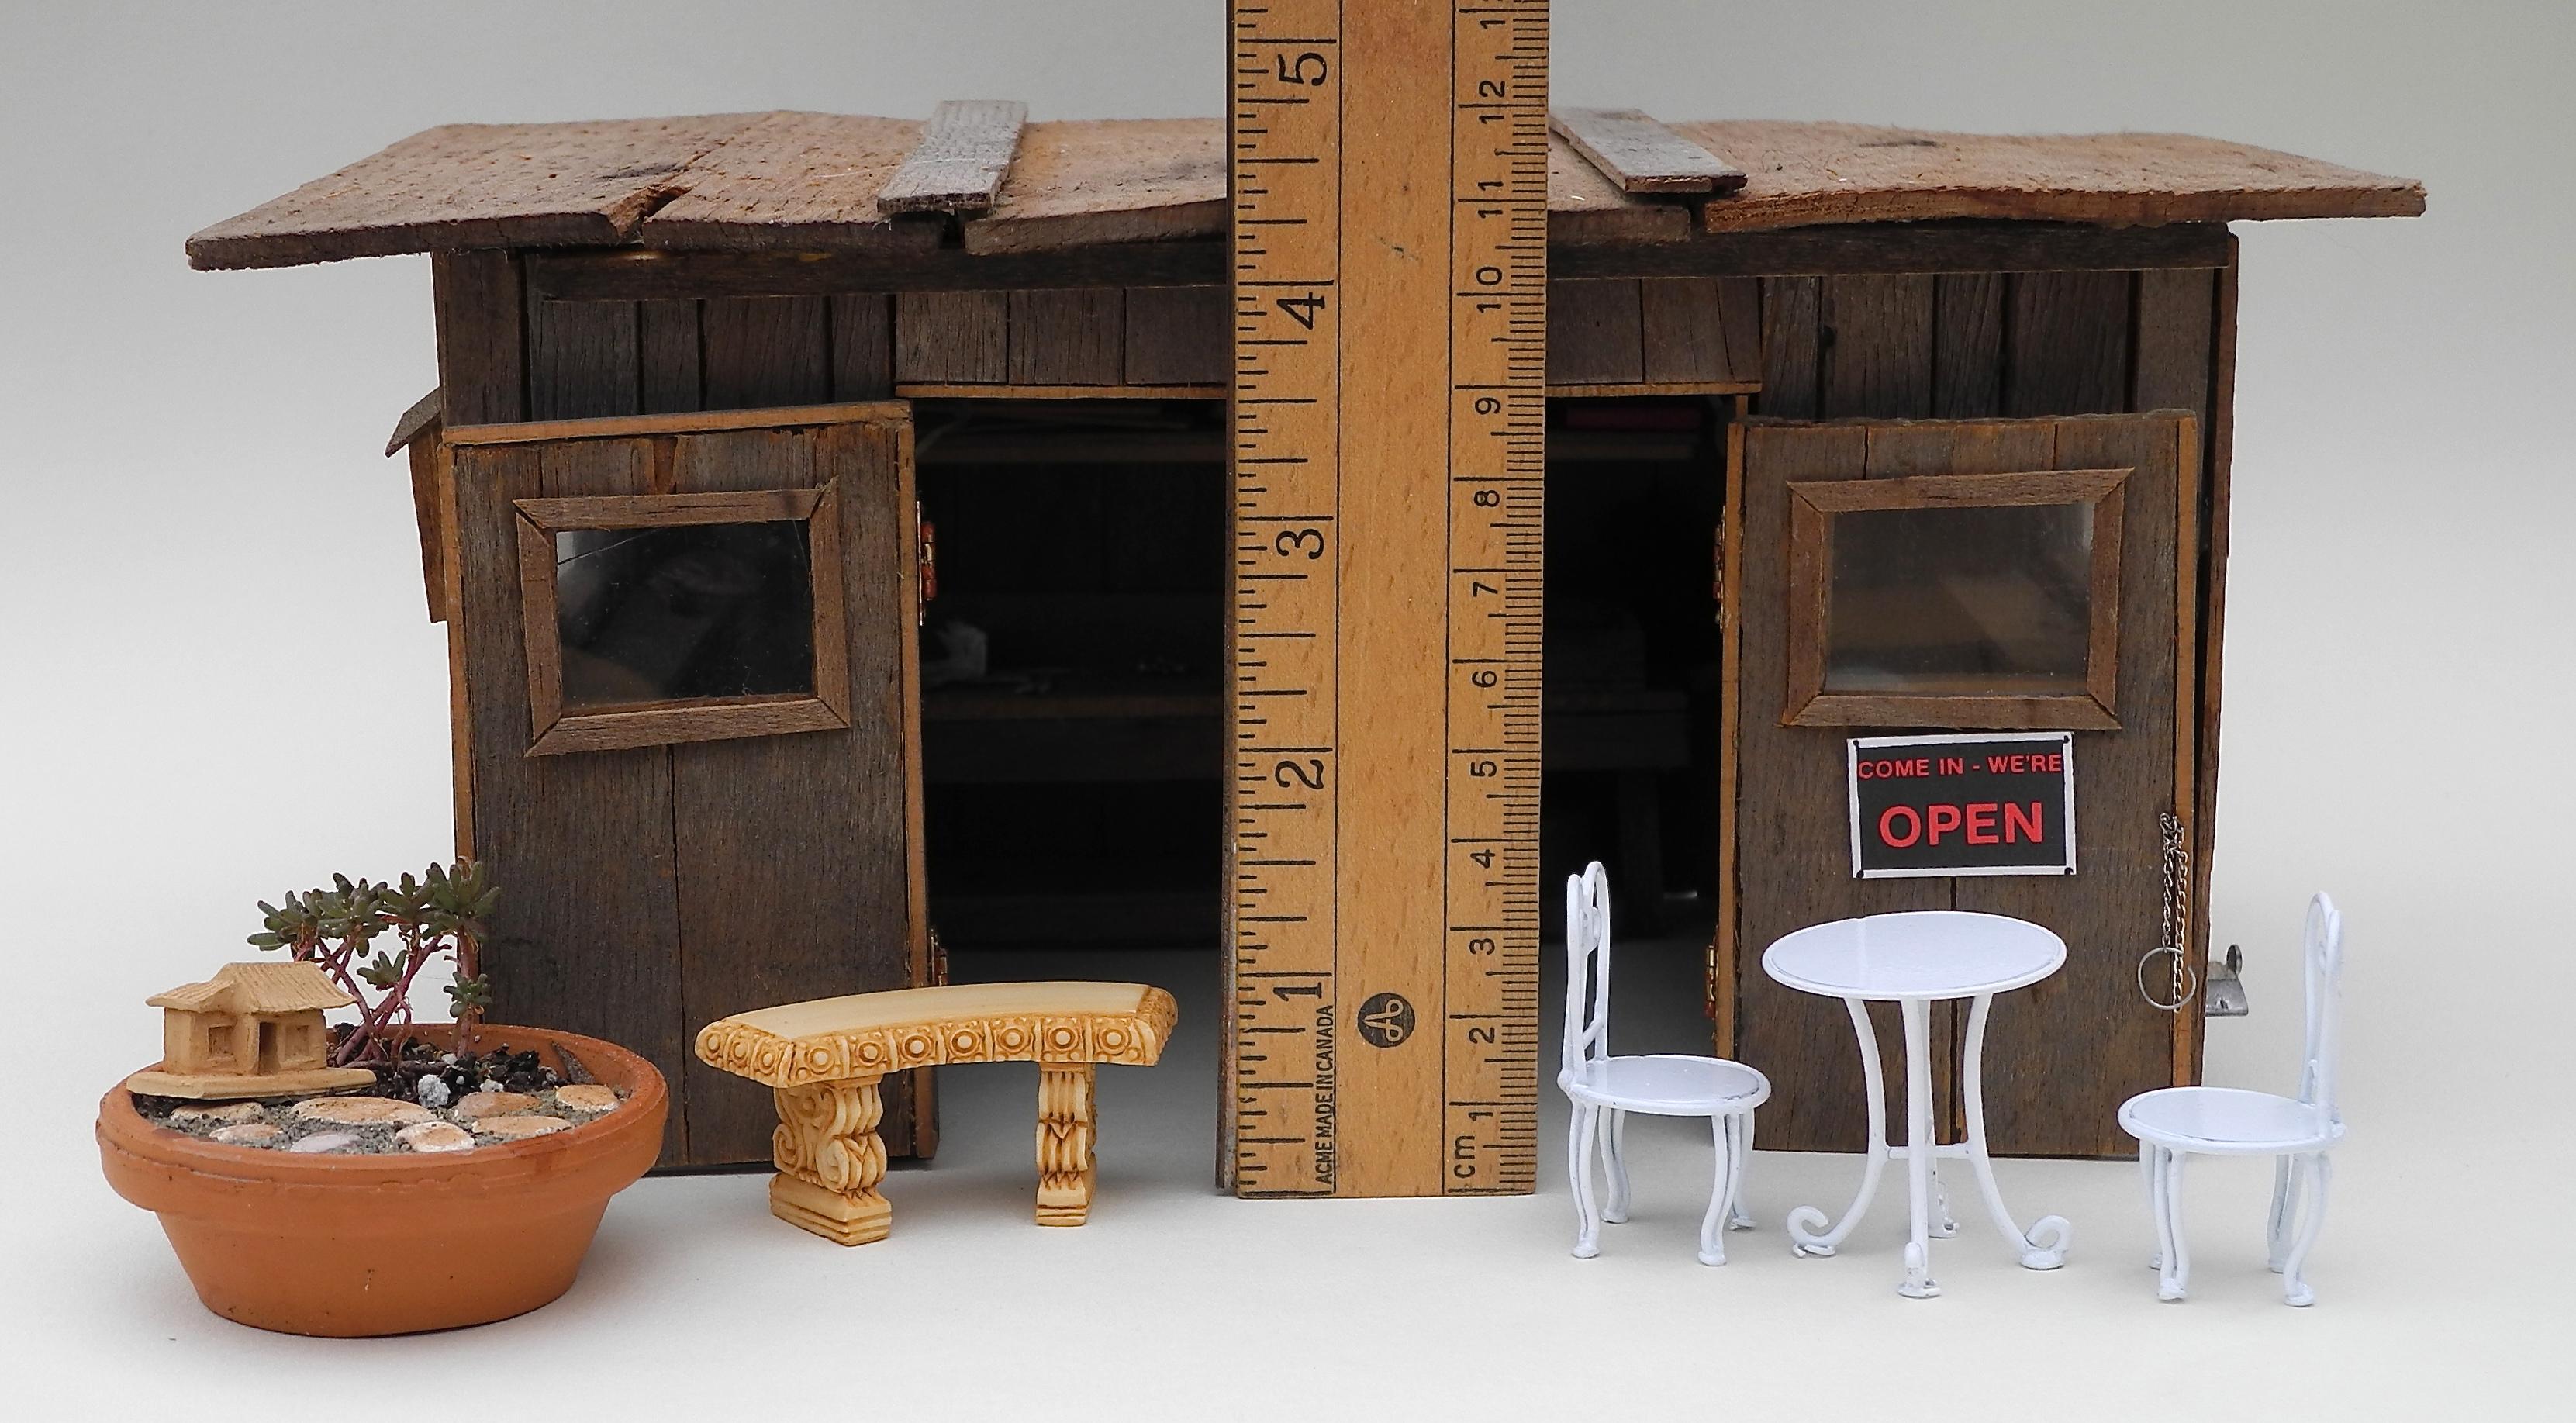 Half-inch scale miniature garden accessories